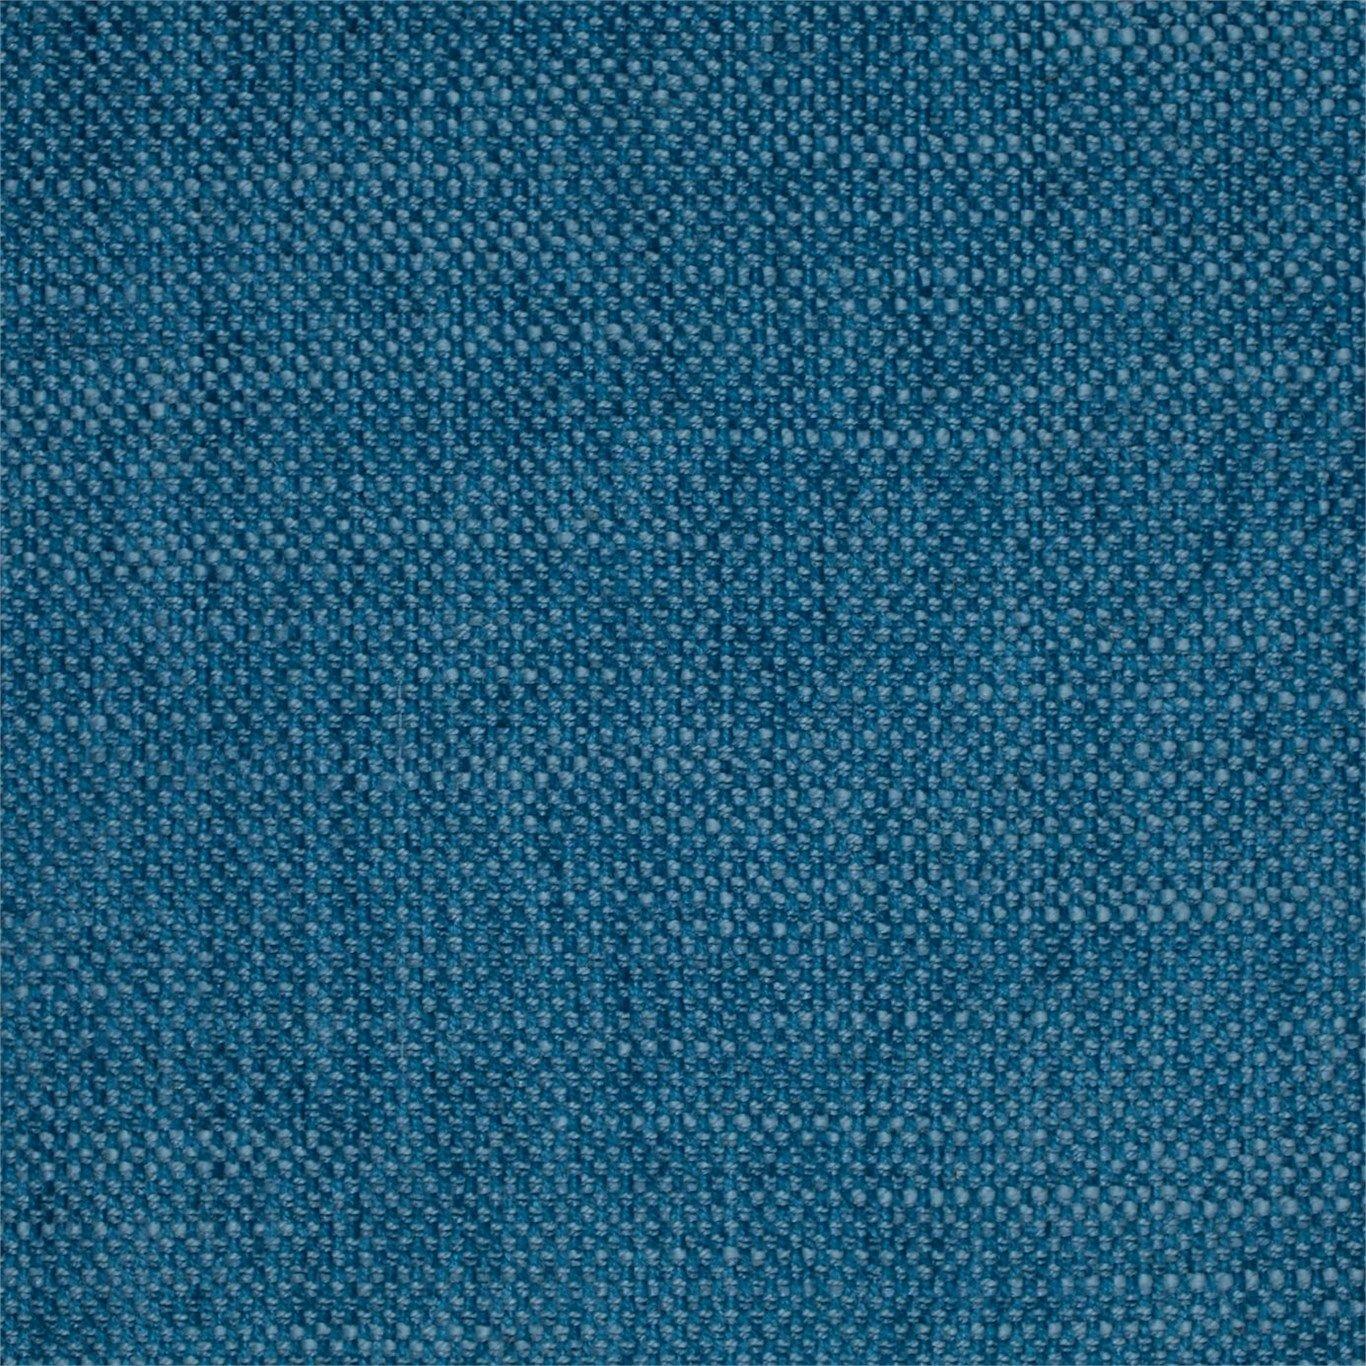 Products harlequin designer fabrics and wallpapers paradise - Products Harlequin Designer Fabrics And Wallpapers Allegra Hbc09688 Allegra Plains